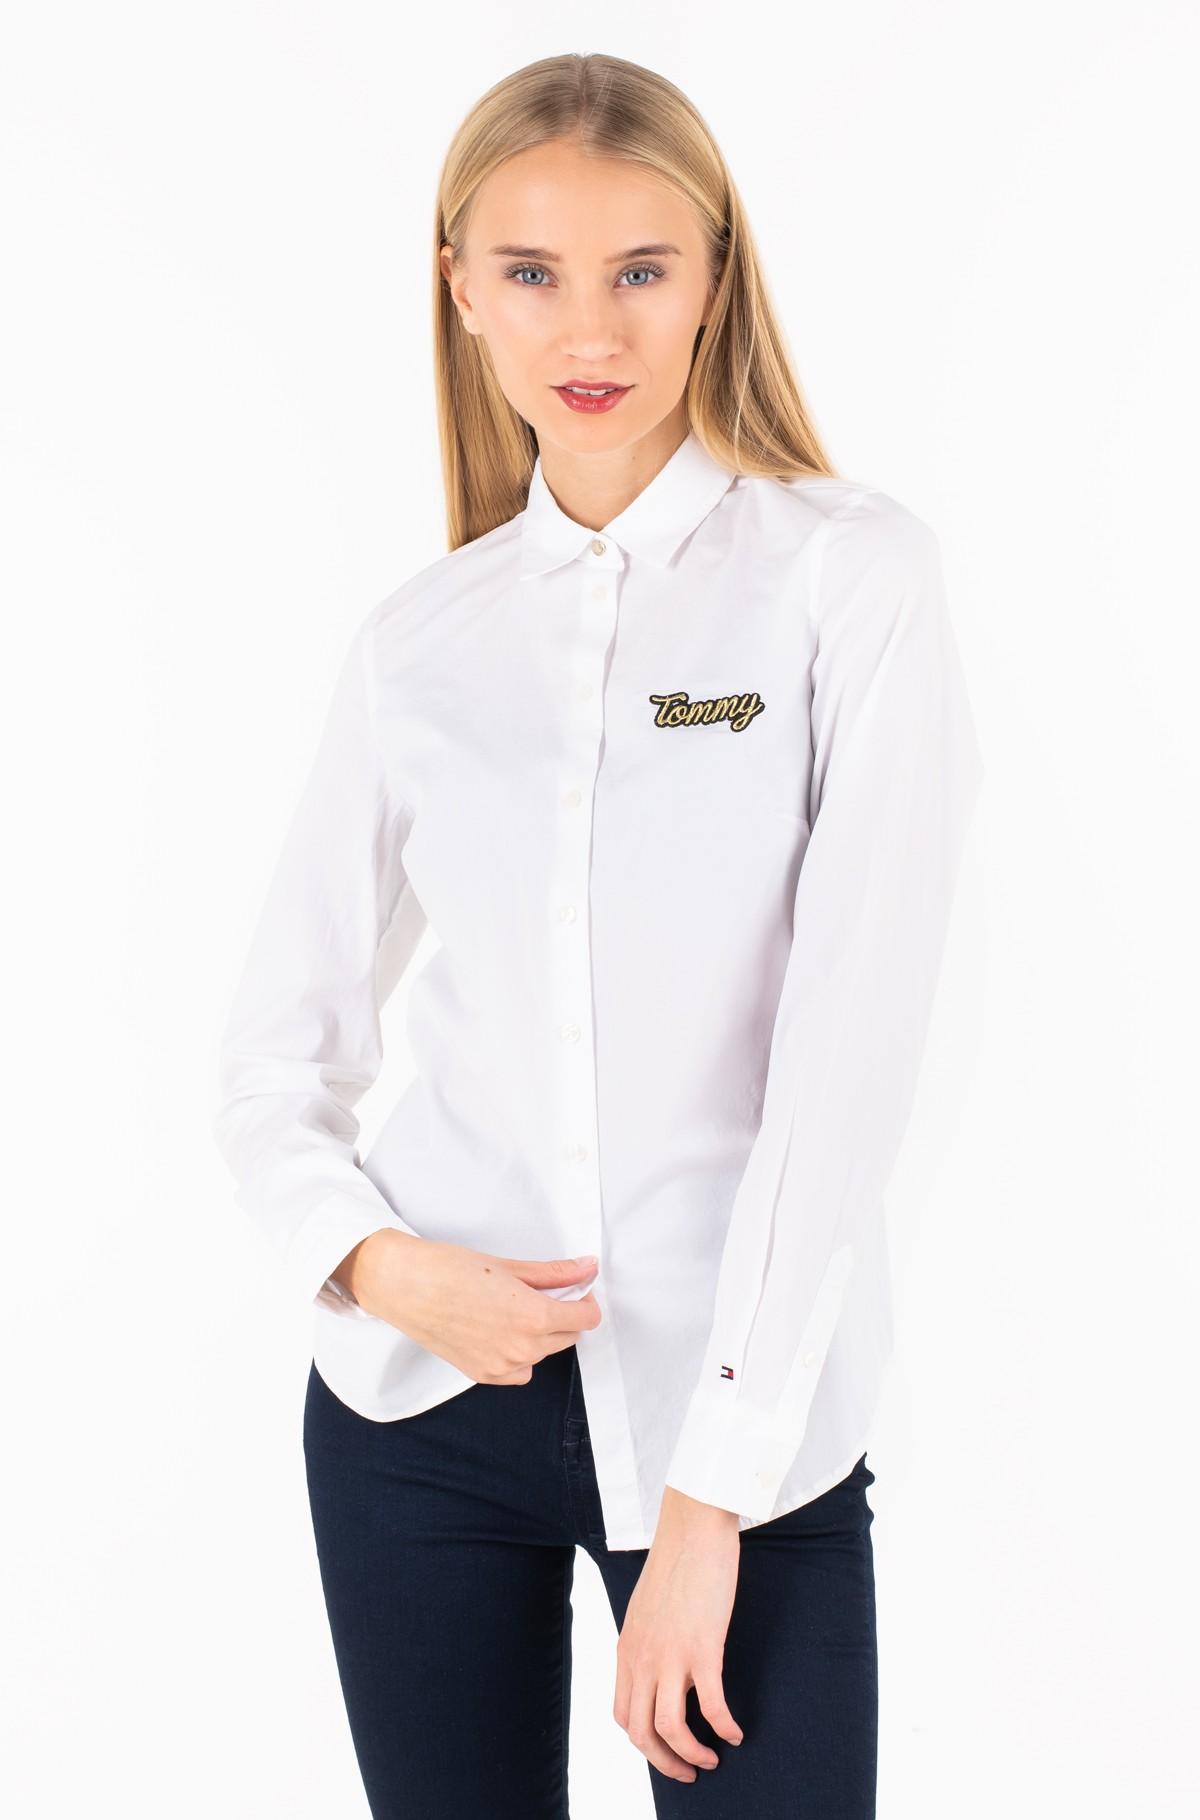 Marškiniai LIBBY SHIRT LS W2-full-1